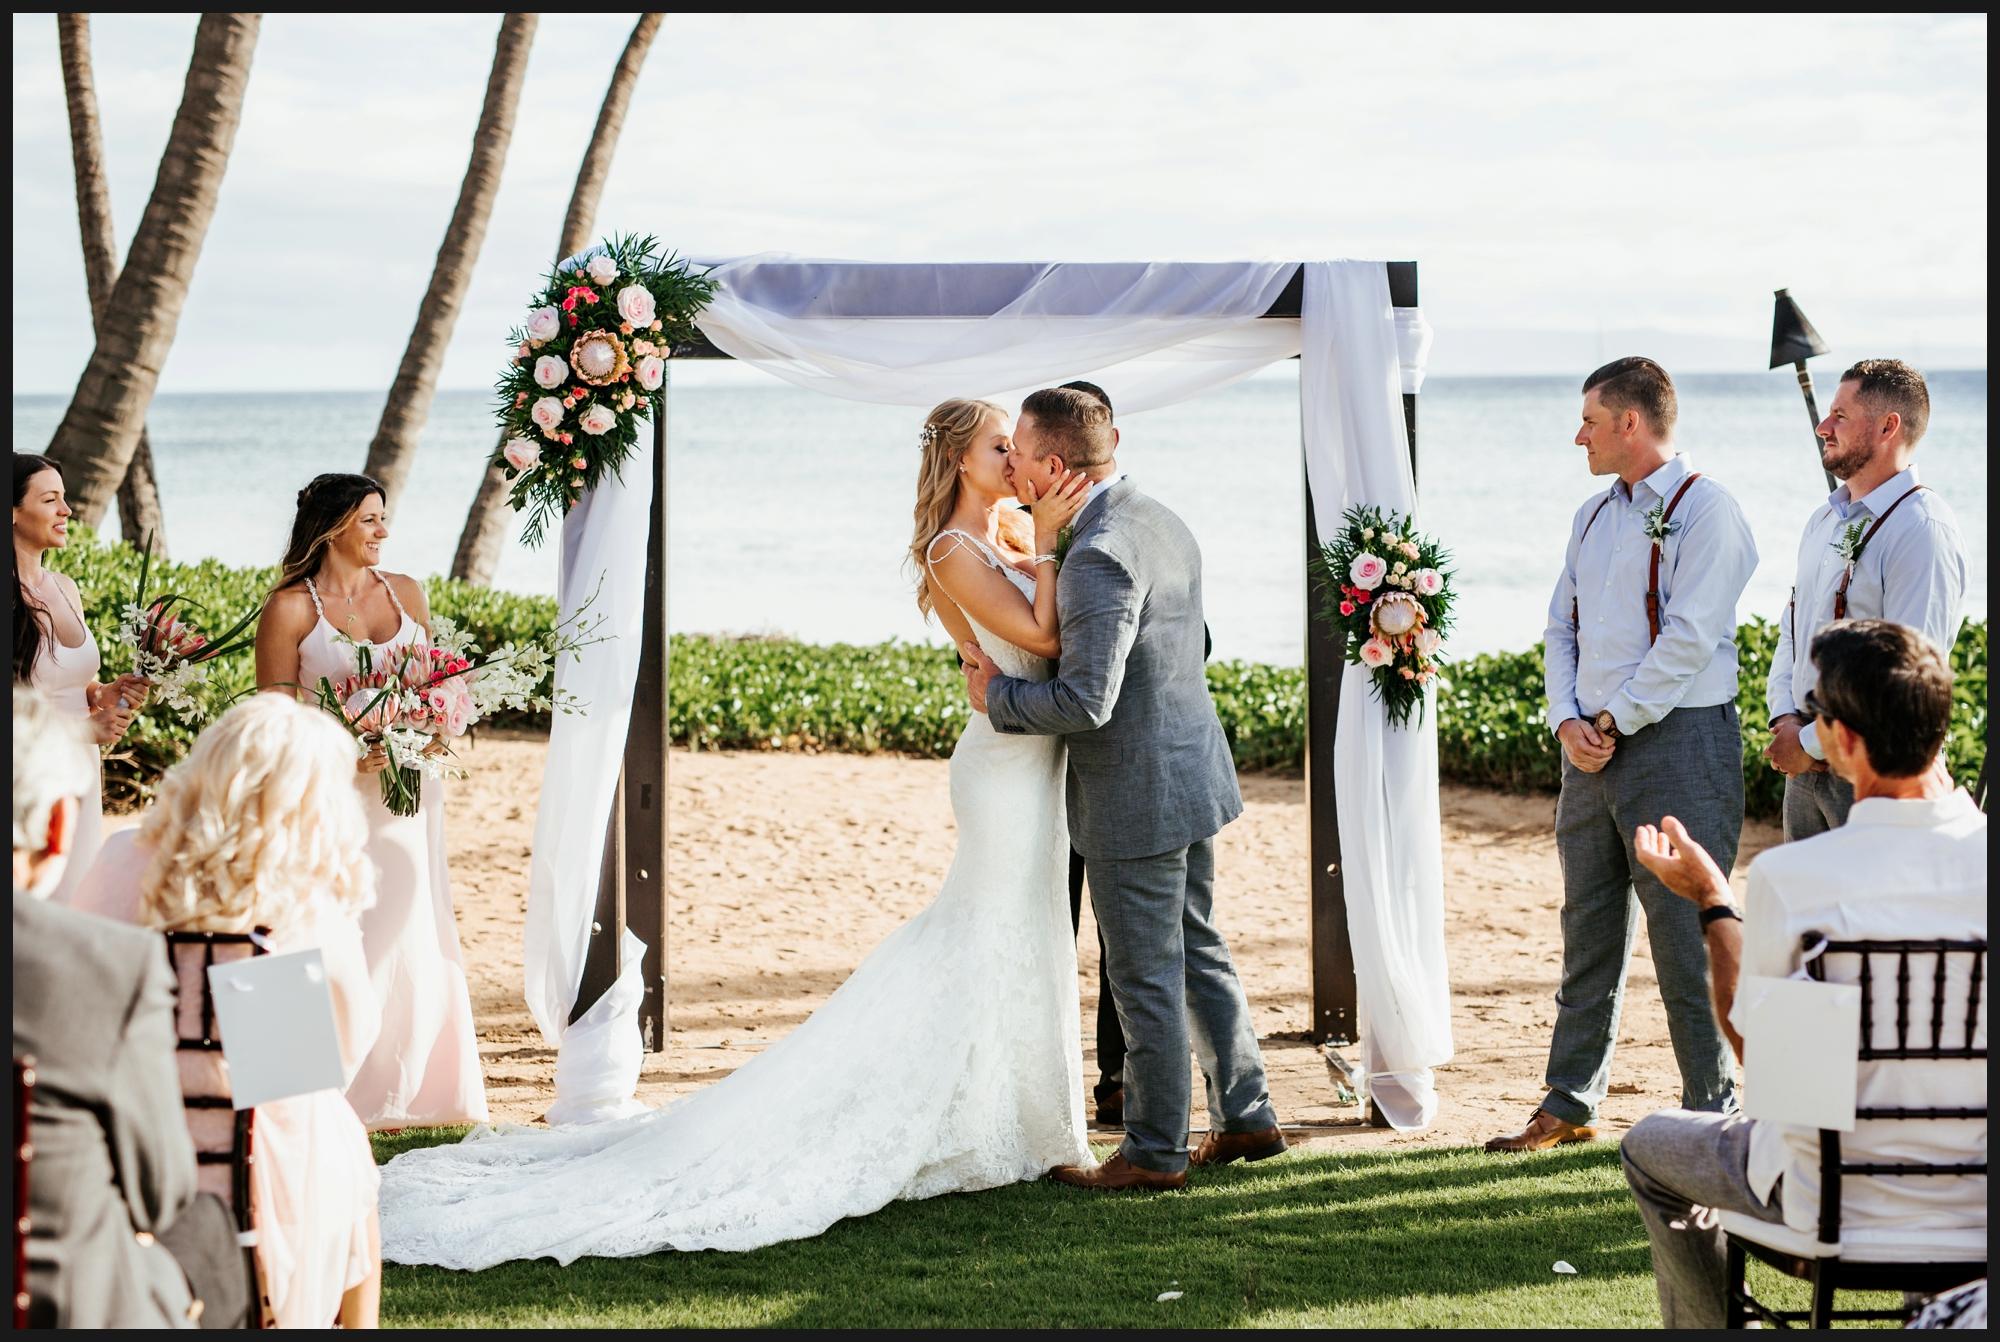 Orlando-Wedding-Photographer-destination-wedding-photographer-florida-wedding-photographer-hawaii-wedding-photographer_0063.jpg